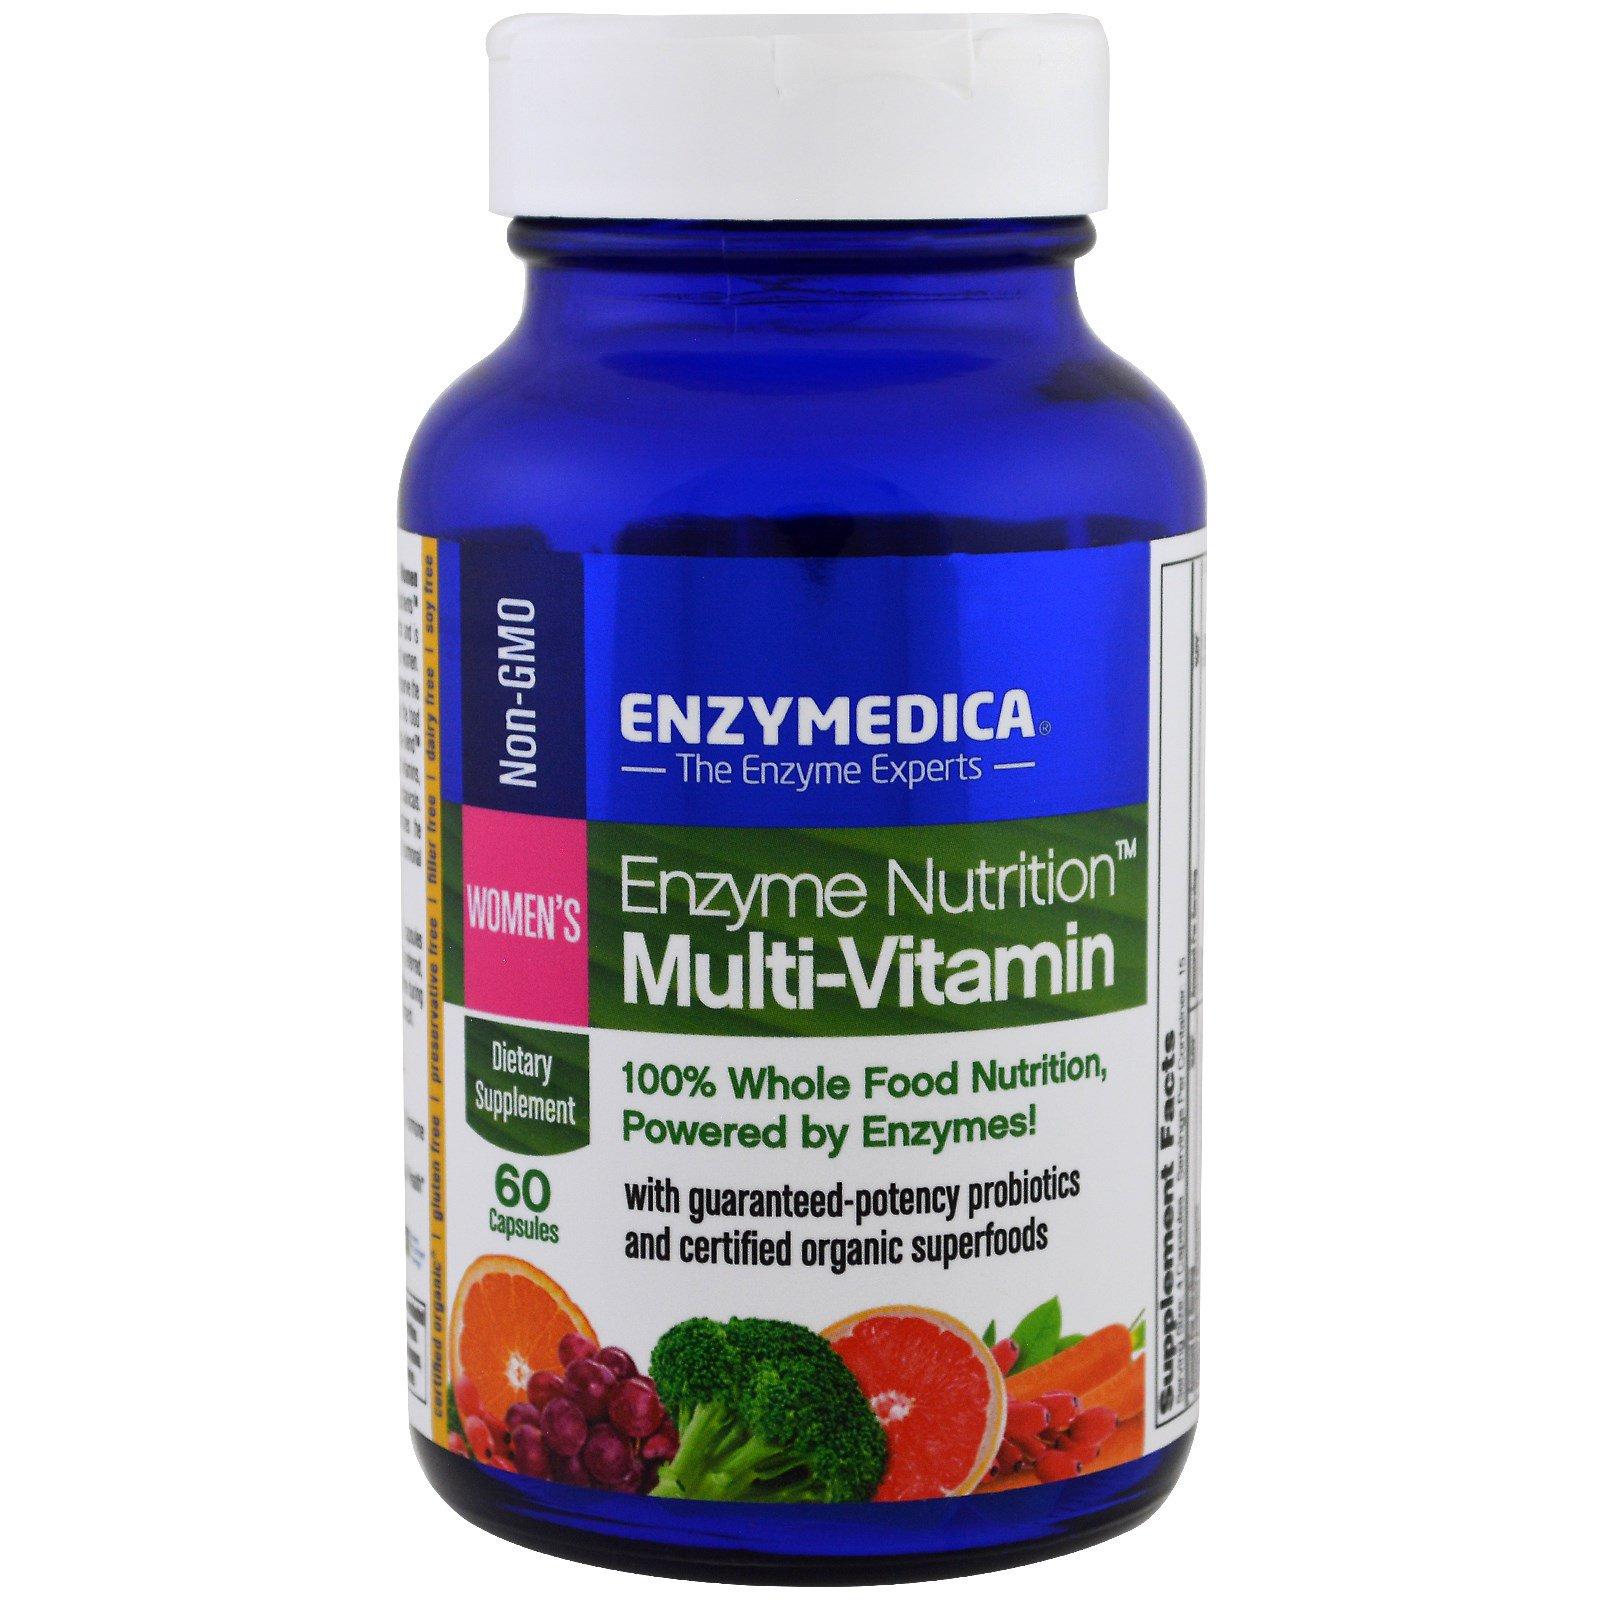 Enzymedica, Белковое питание, мультивитамины для женщин, 60 капсул